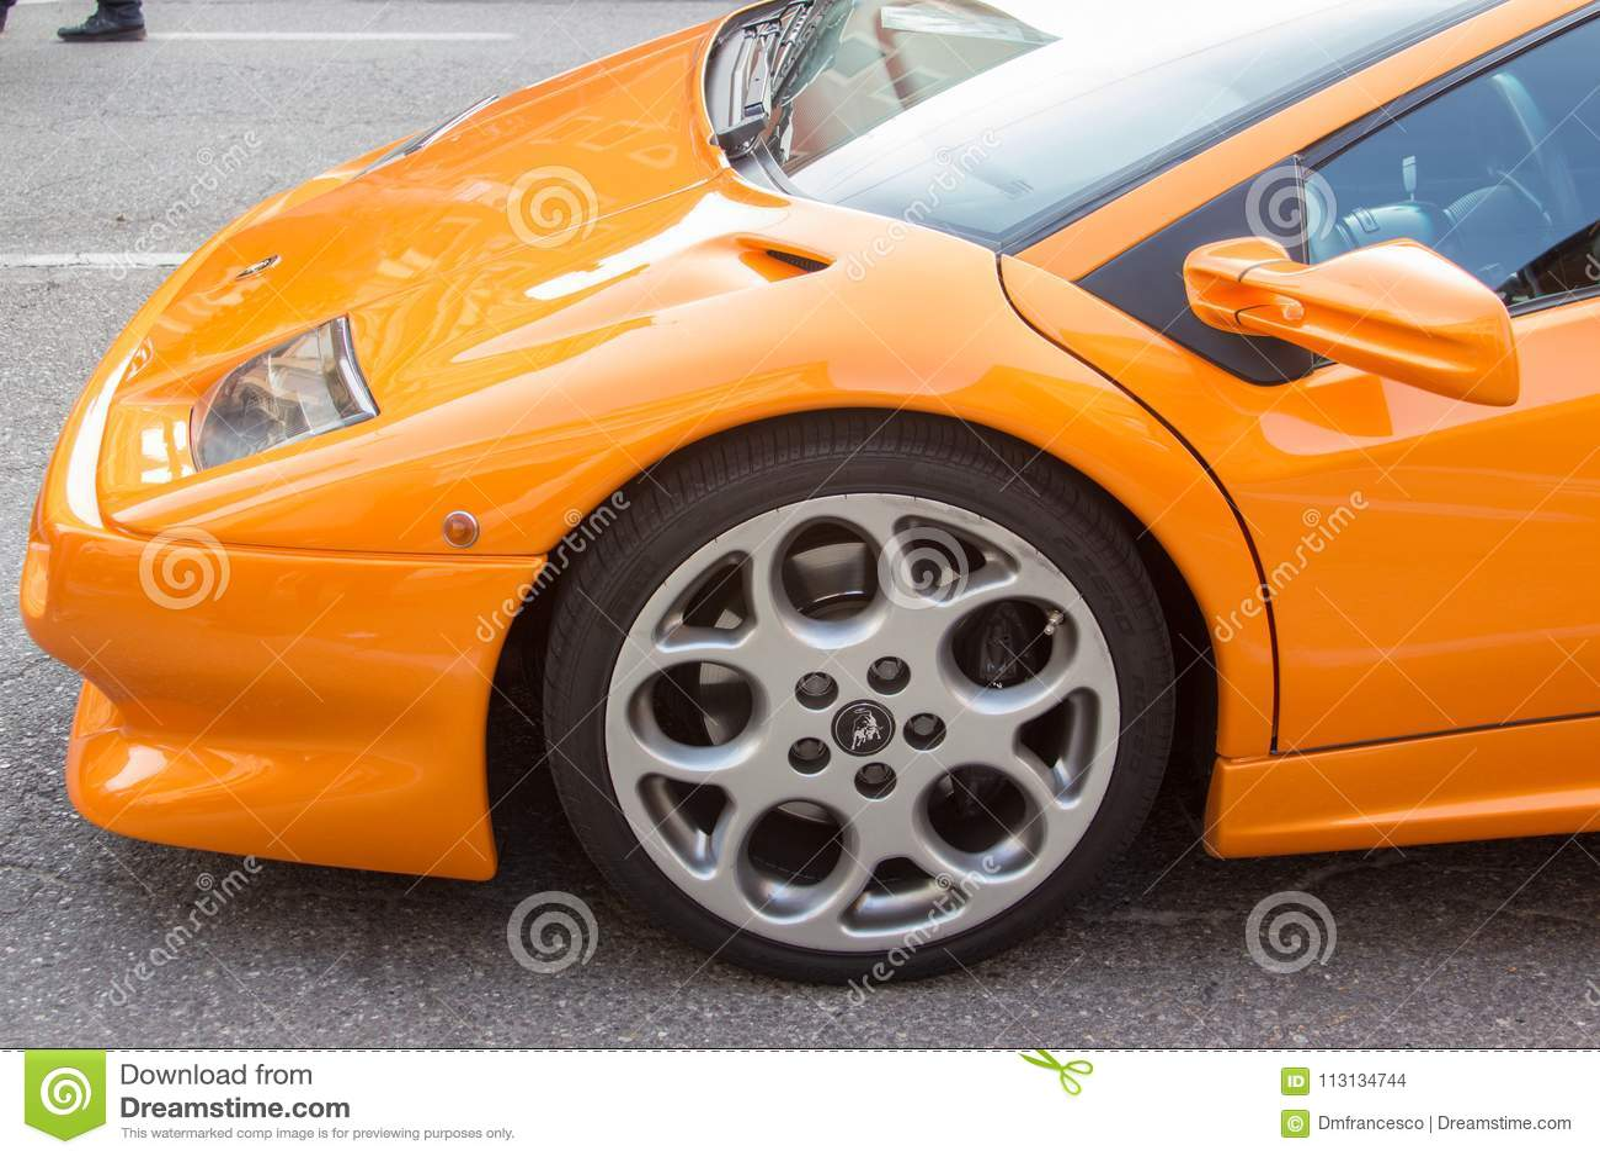 Super Sport Cars Maranello Italy Editorial Stock Image Image Of